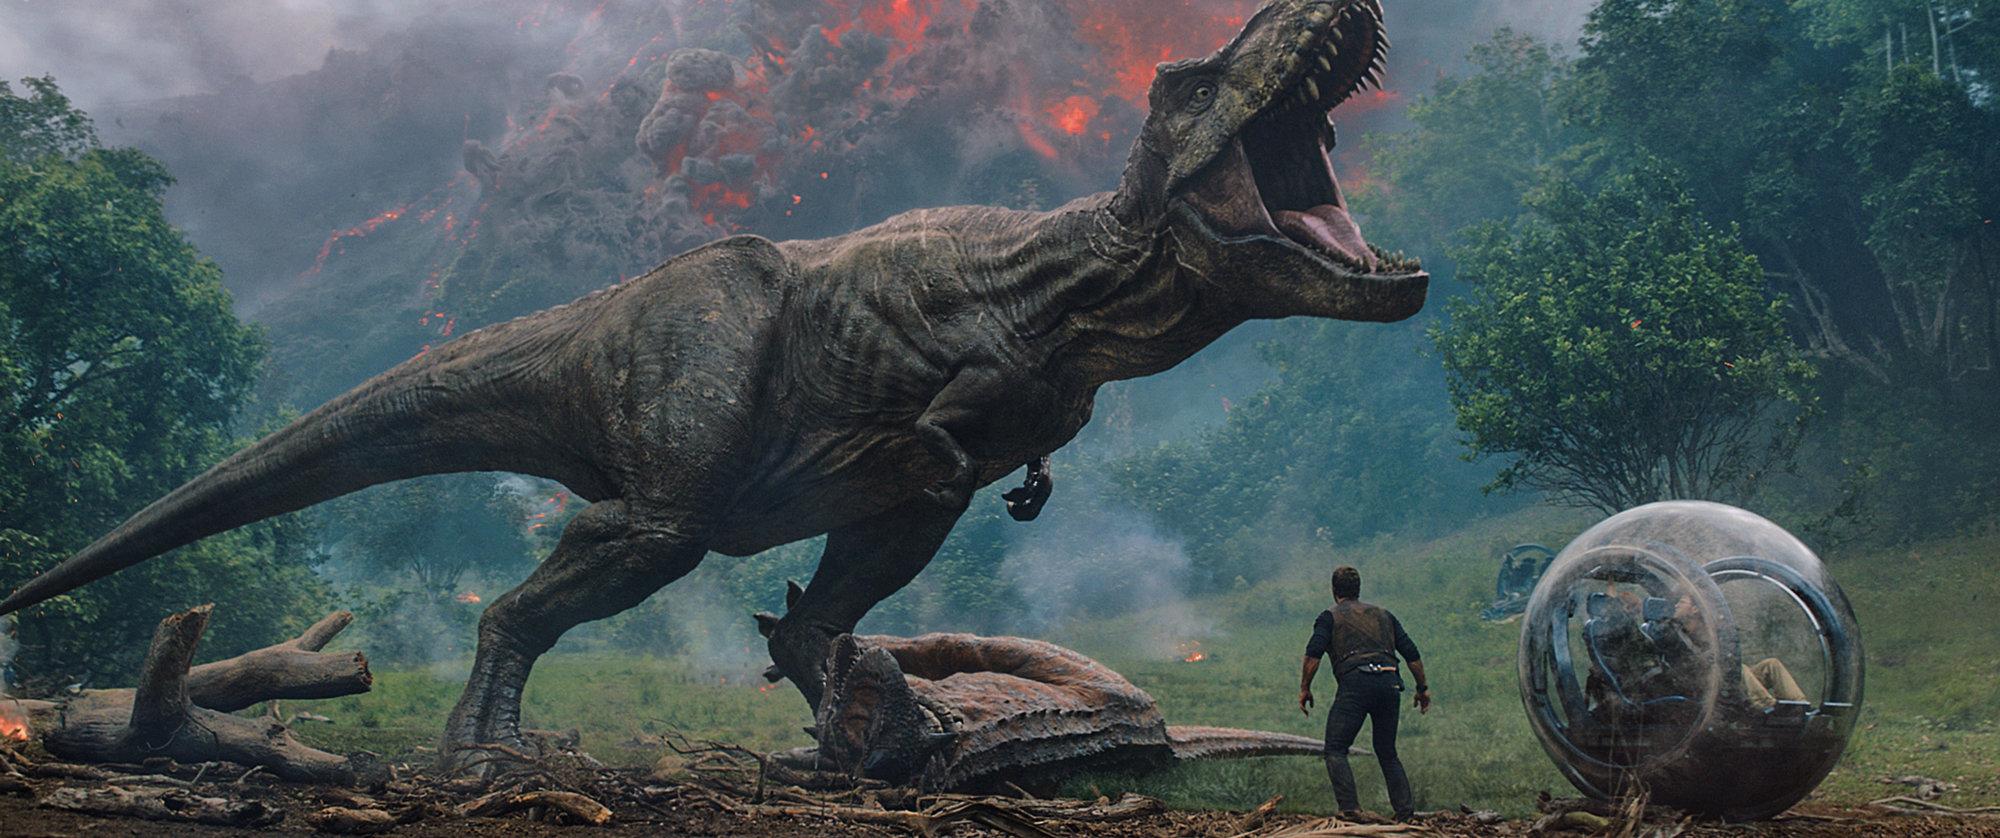 Scena iz filma Jurski park: Padlo kraljestvo (Jurassic Park: Fallen Kingdom)